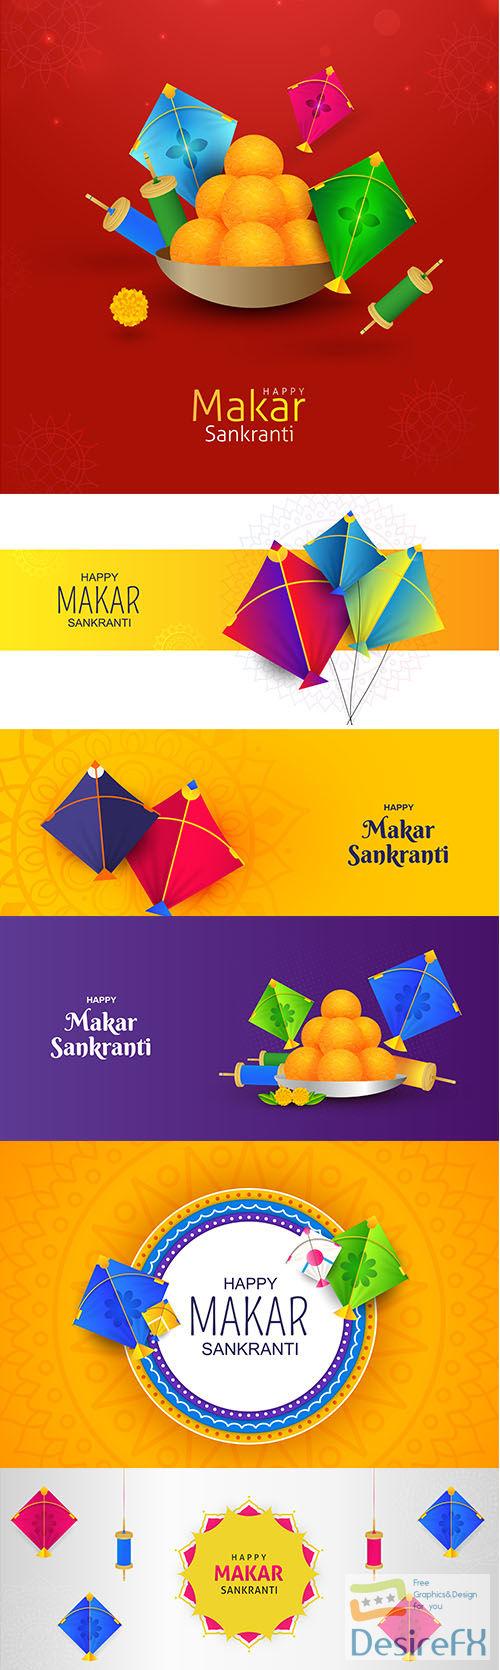 Happy makar sankranti greeting background